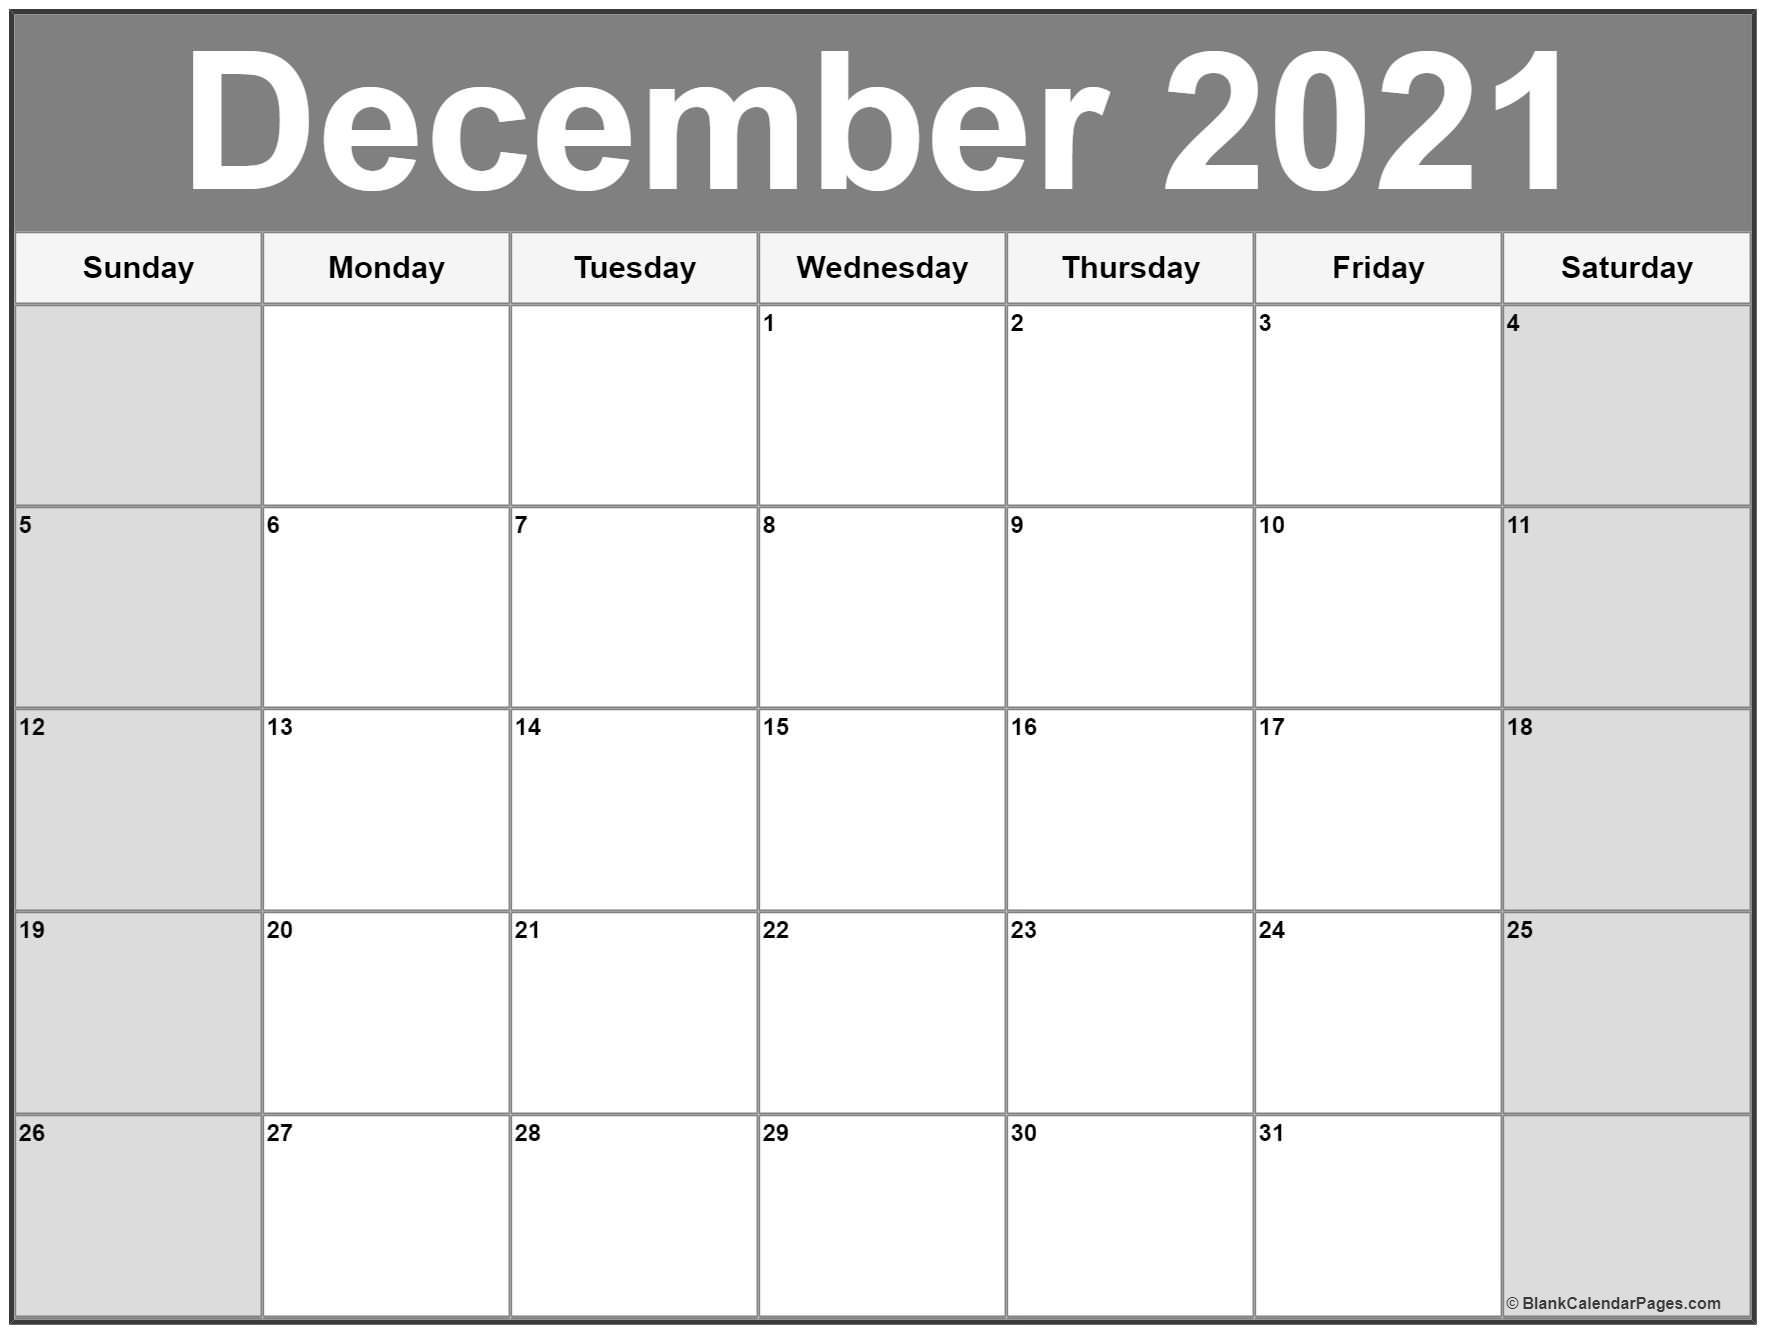 December 2021 Calendar   56+ Templates Of 2021 Printable December Calendar Of 2021